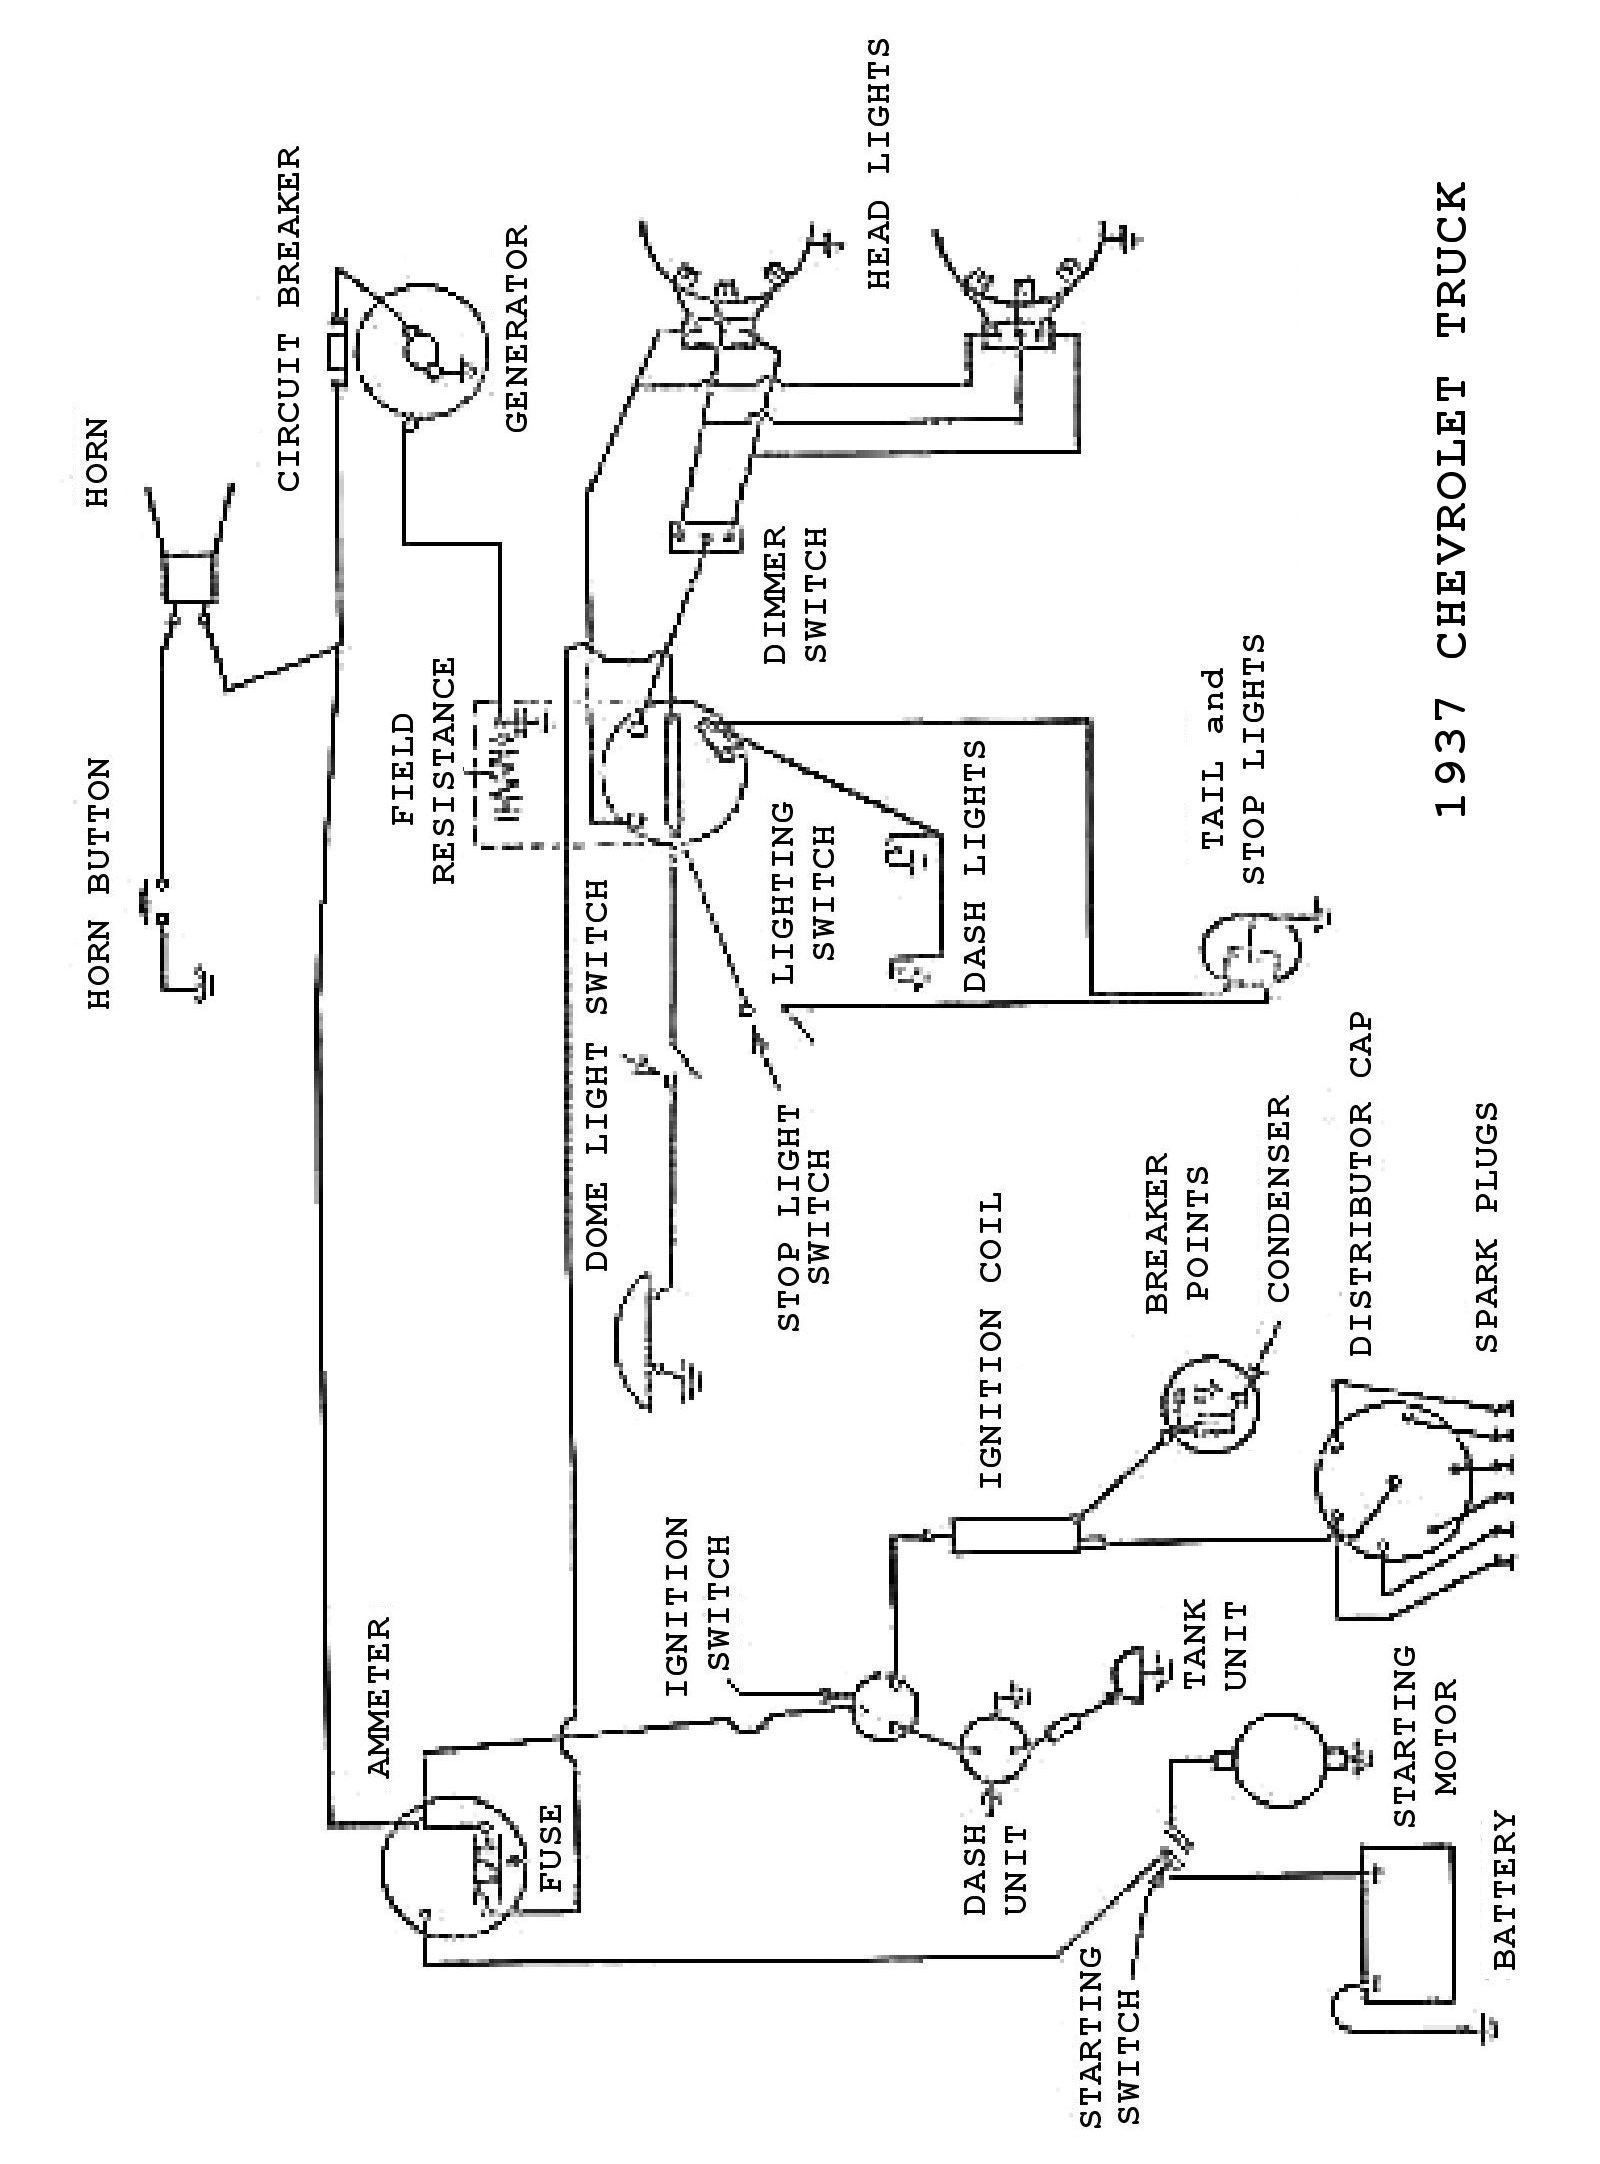 1998 Chevy Silverado Brake Light Wiring Diagram Wiring Diagrams Of 1998 Chevy Silverado Brake Light Wiring Diagram